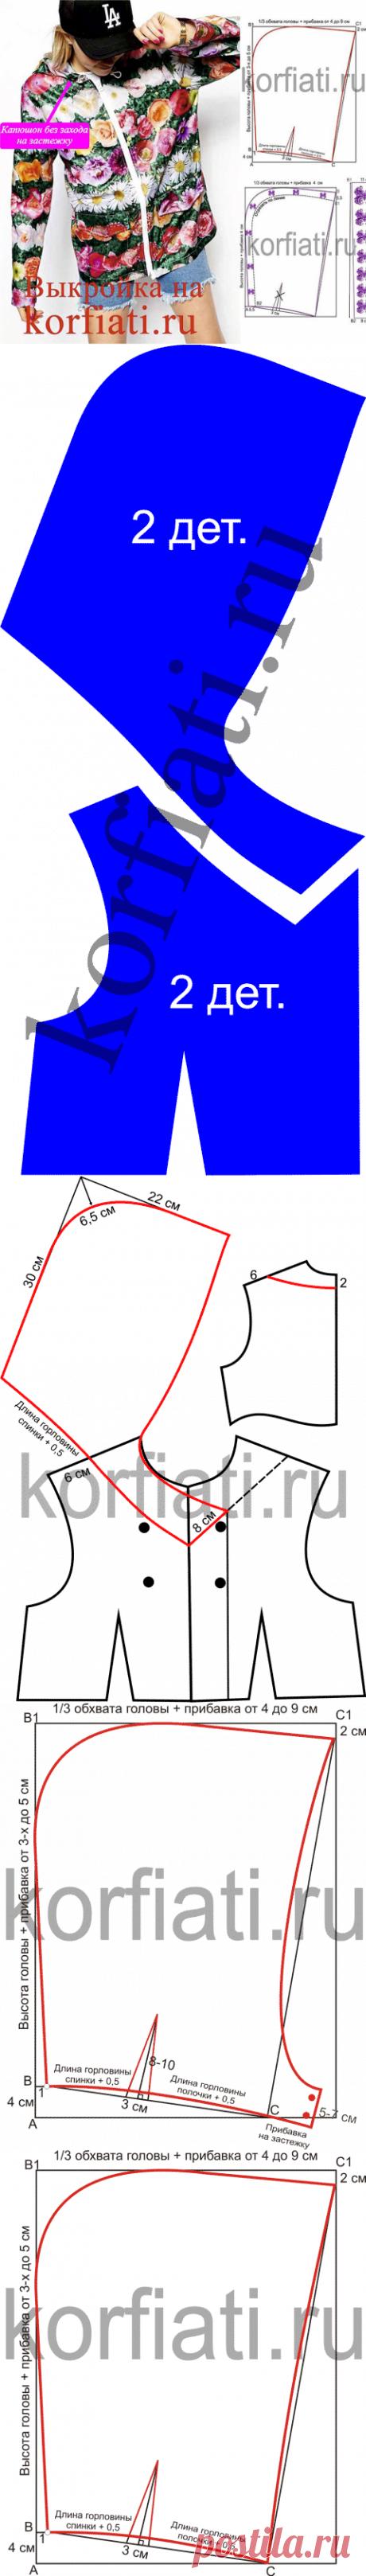 Buscar posts: выкройка капюшона